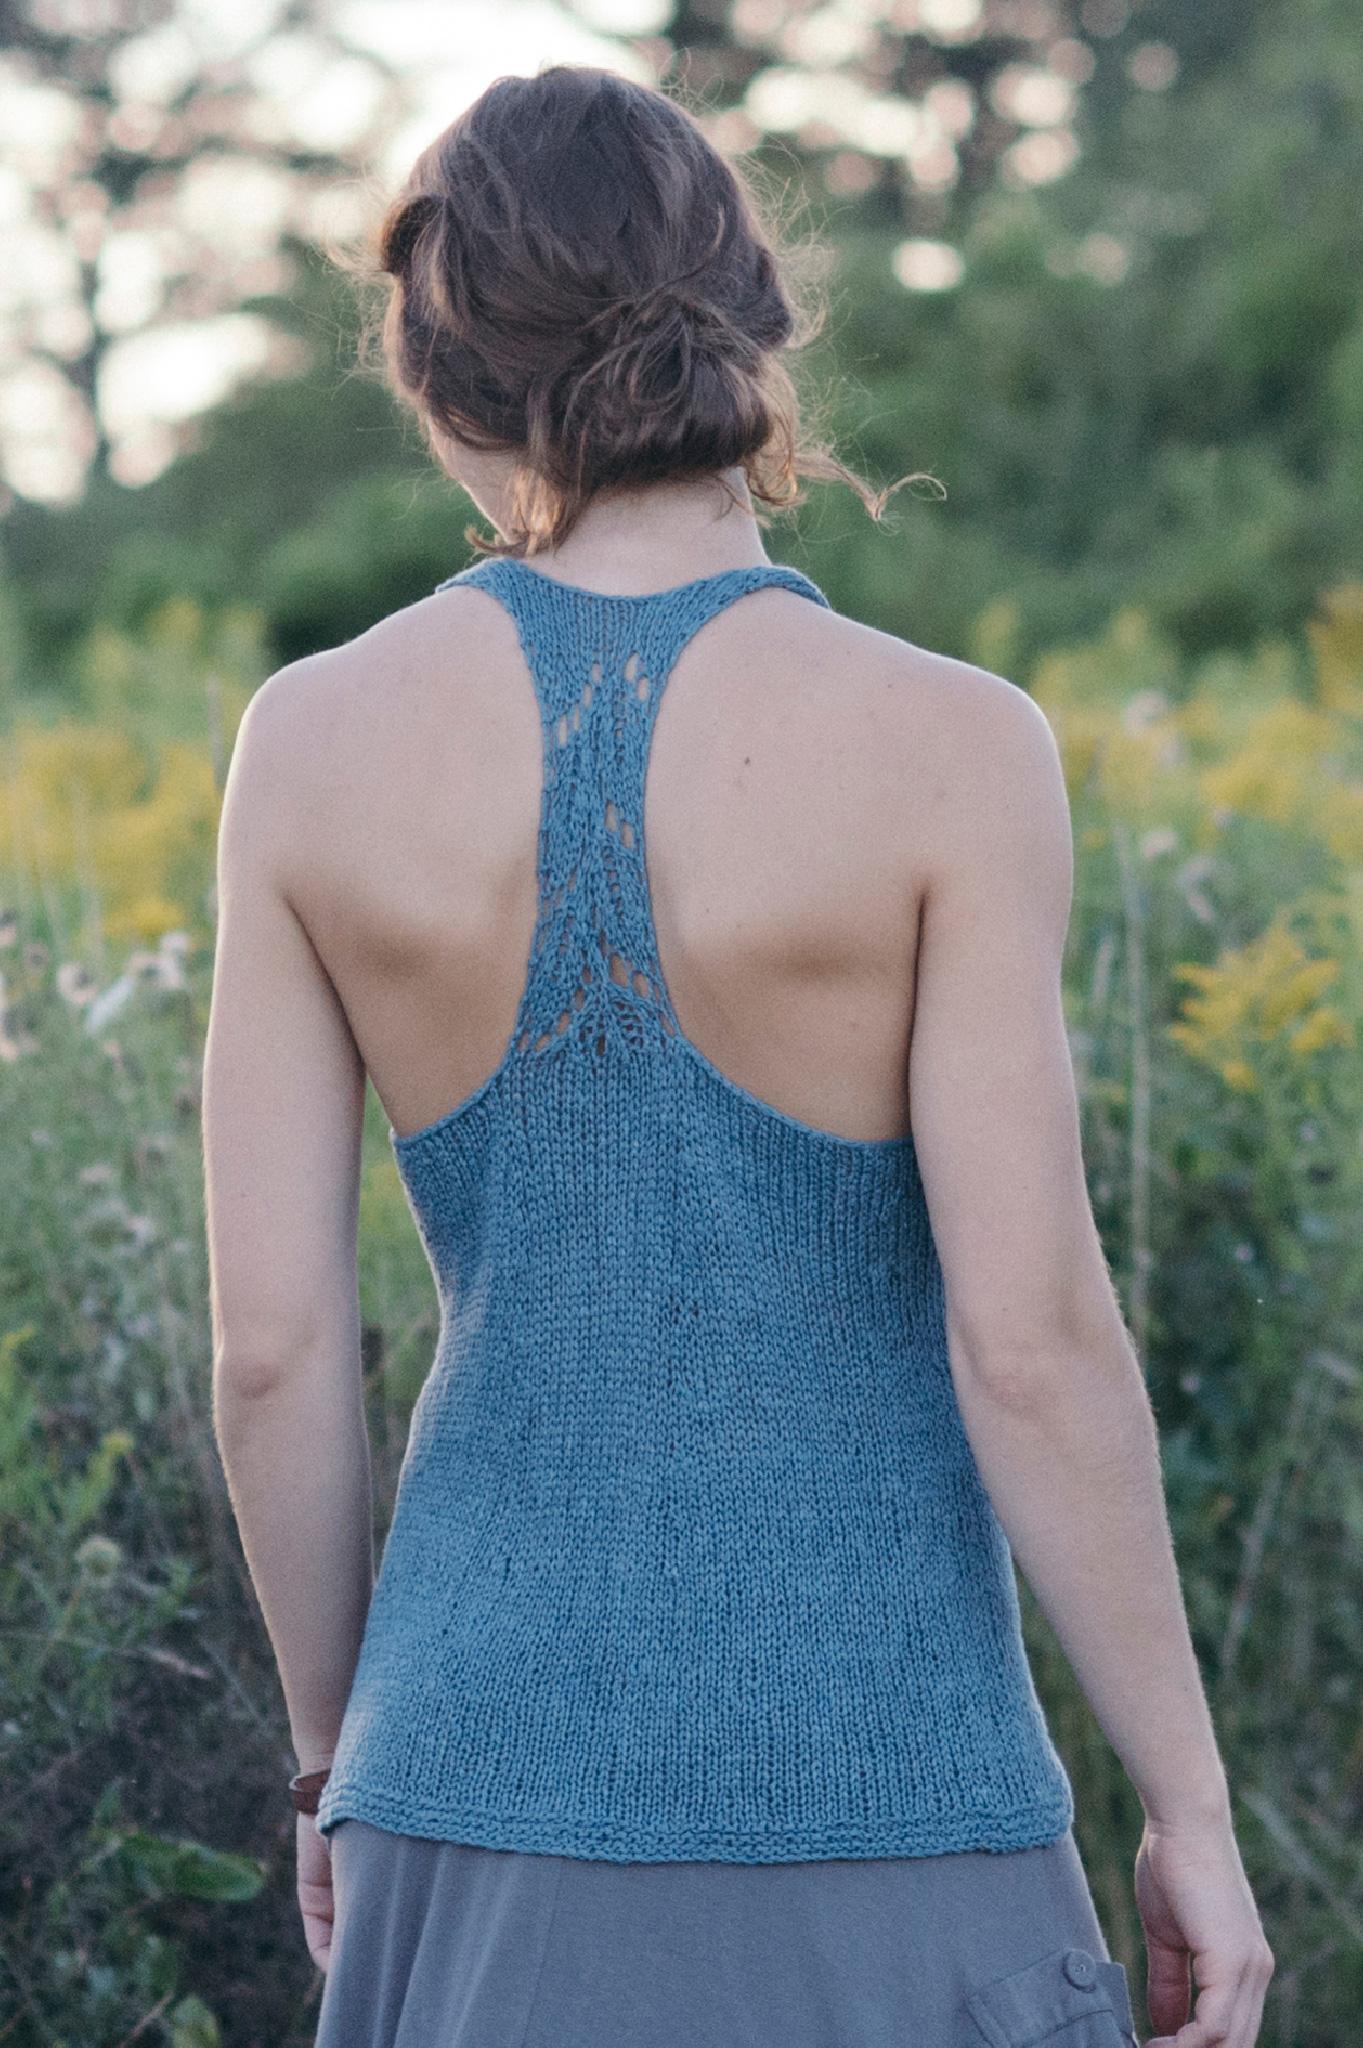 quince-co-ripley-leah-b-thibault-knitting-pattern-kestrel-2.jpg